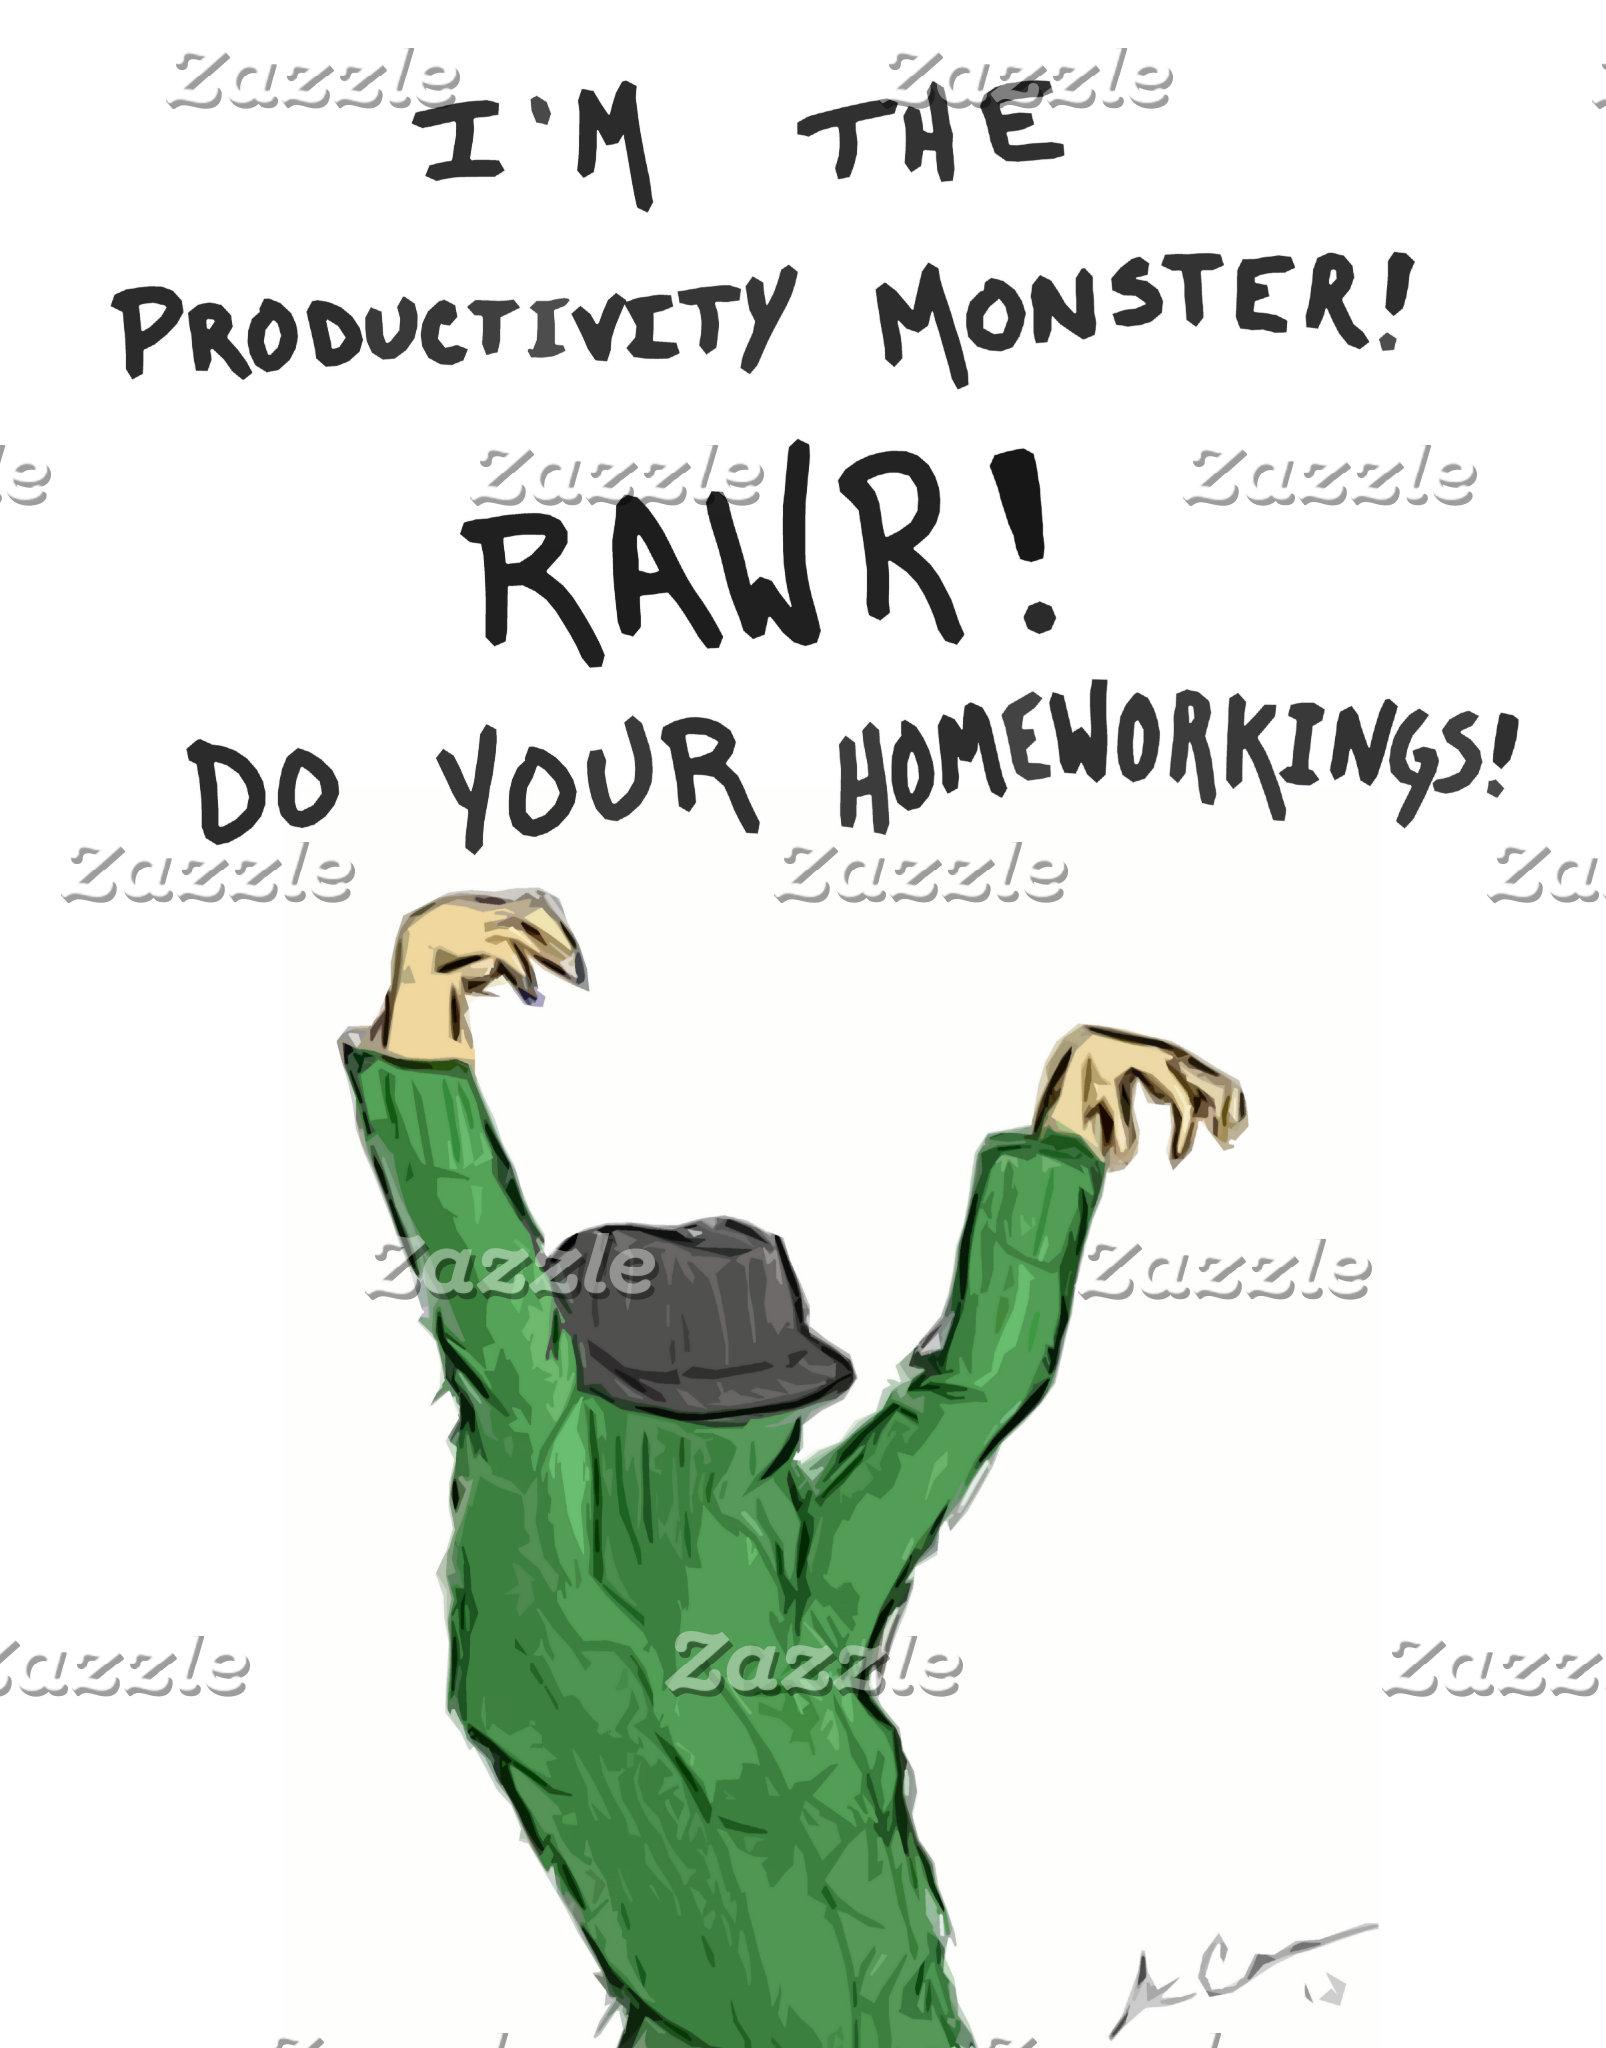 Productivity Monster